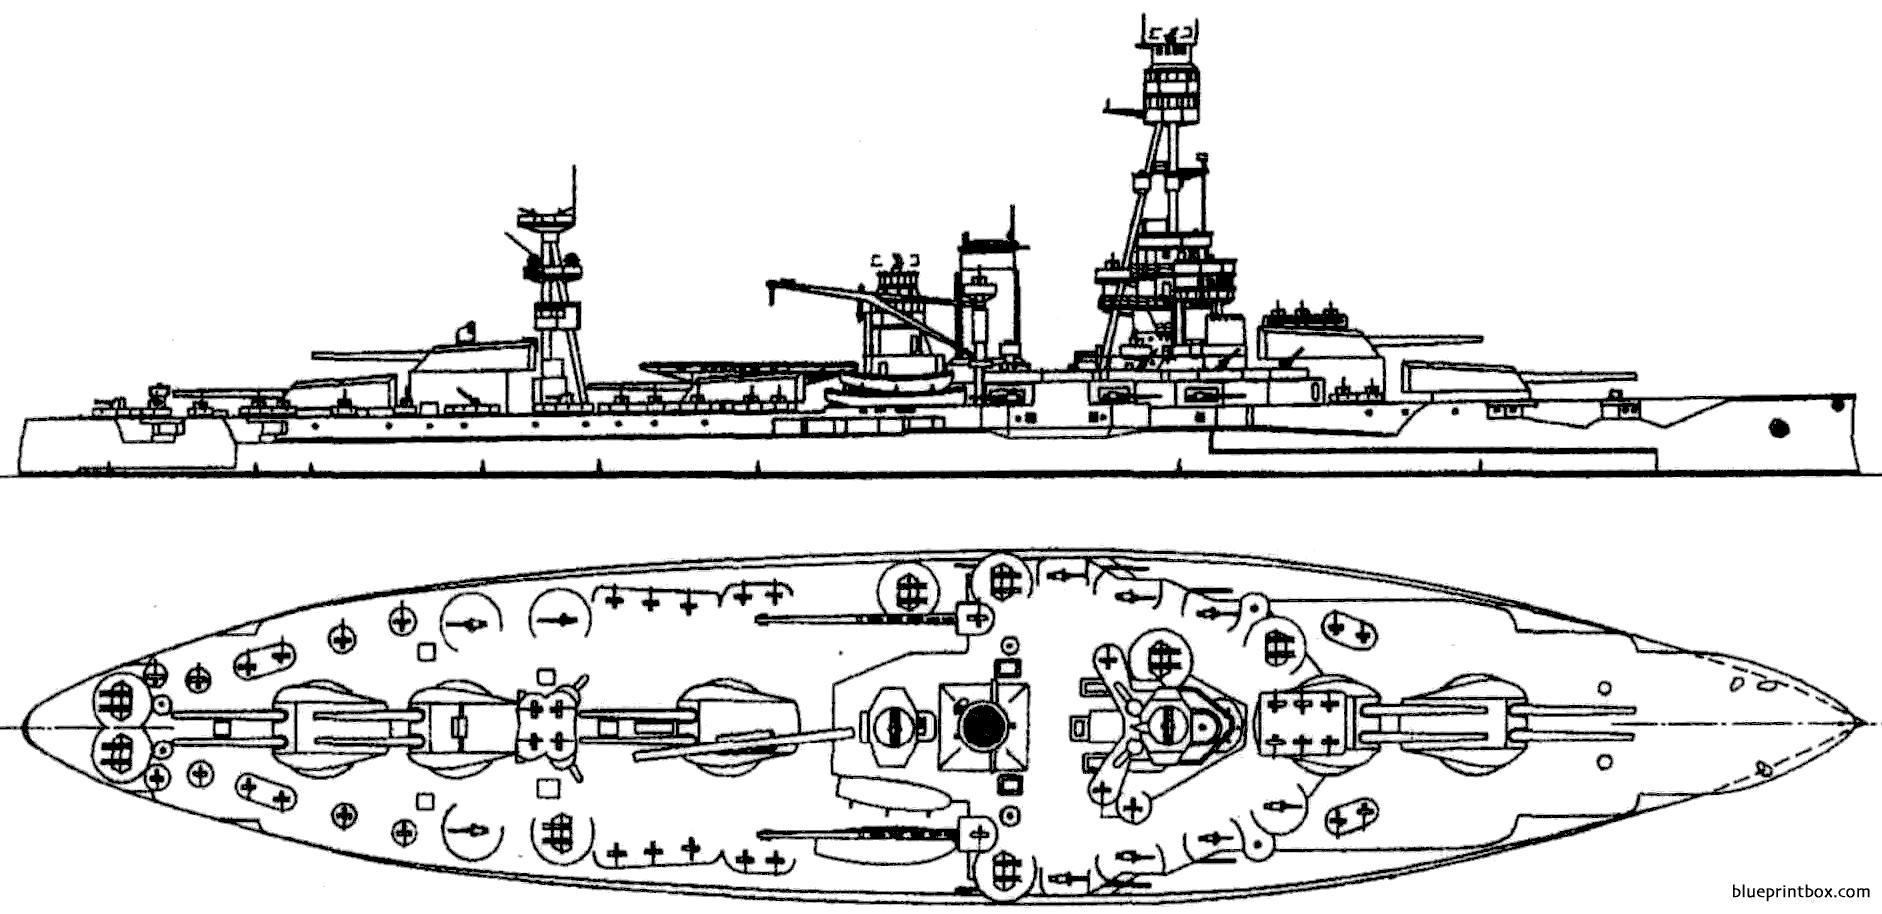 Bb 35 Uss Texas 1942 - Blueprintbox Com